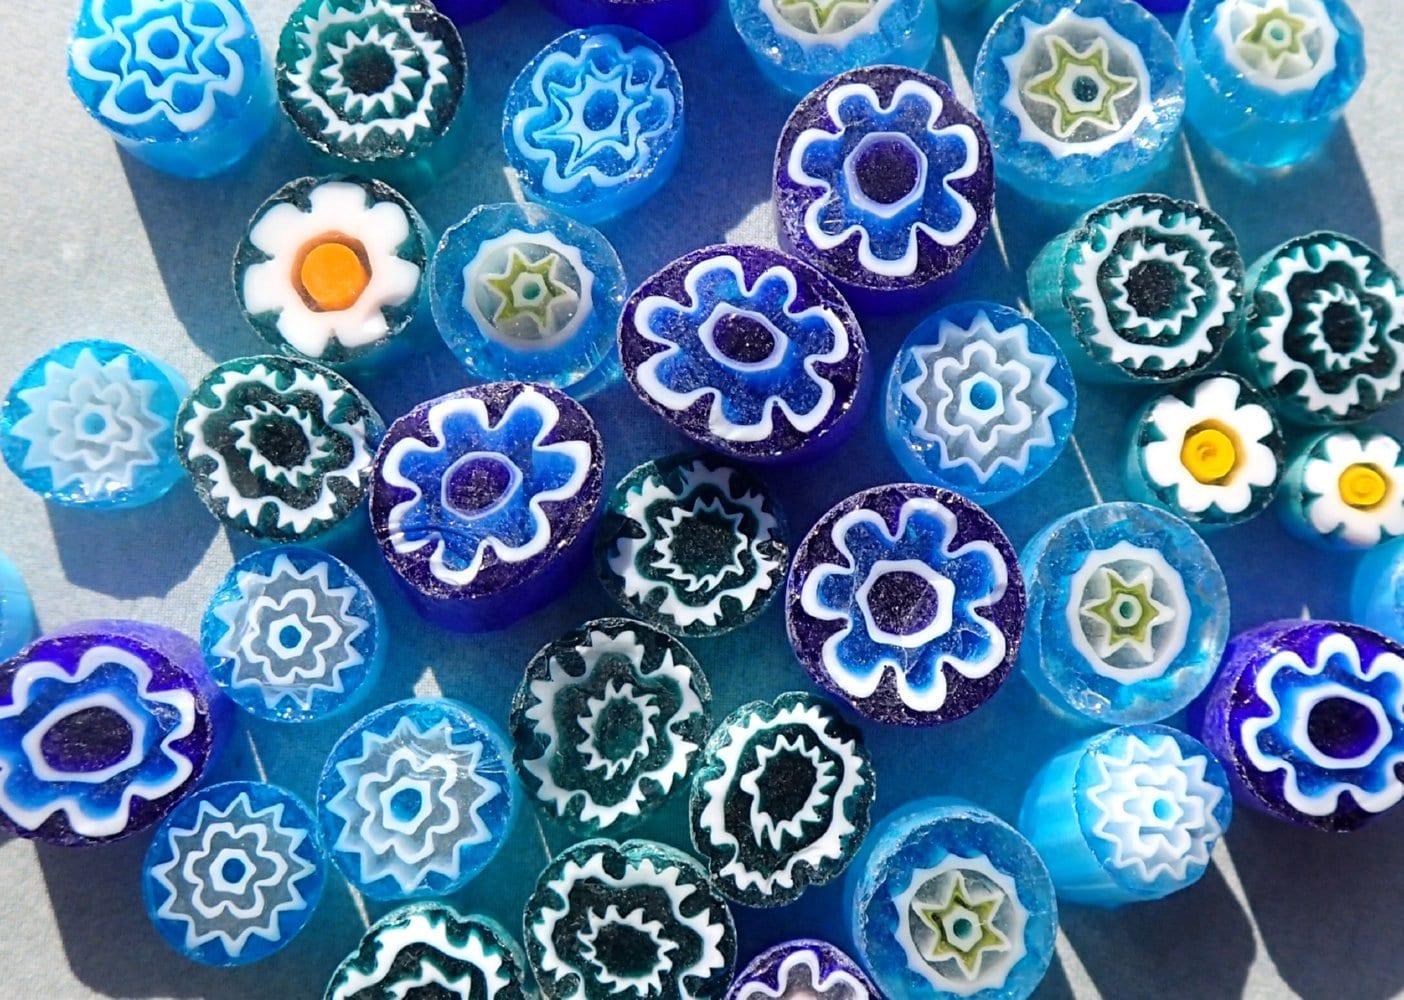 By the Sea Blue Millefiori - 25 grams - Unique Mosaic Glass Tiles ...